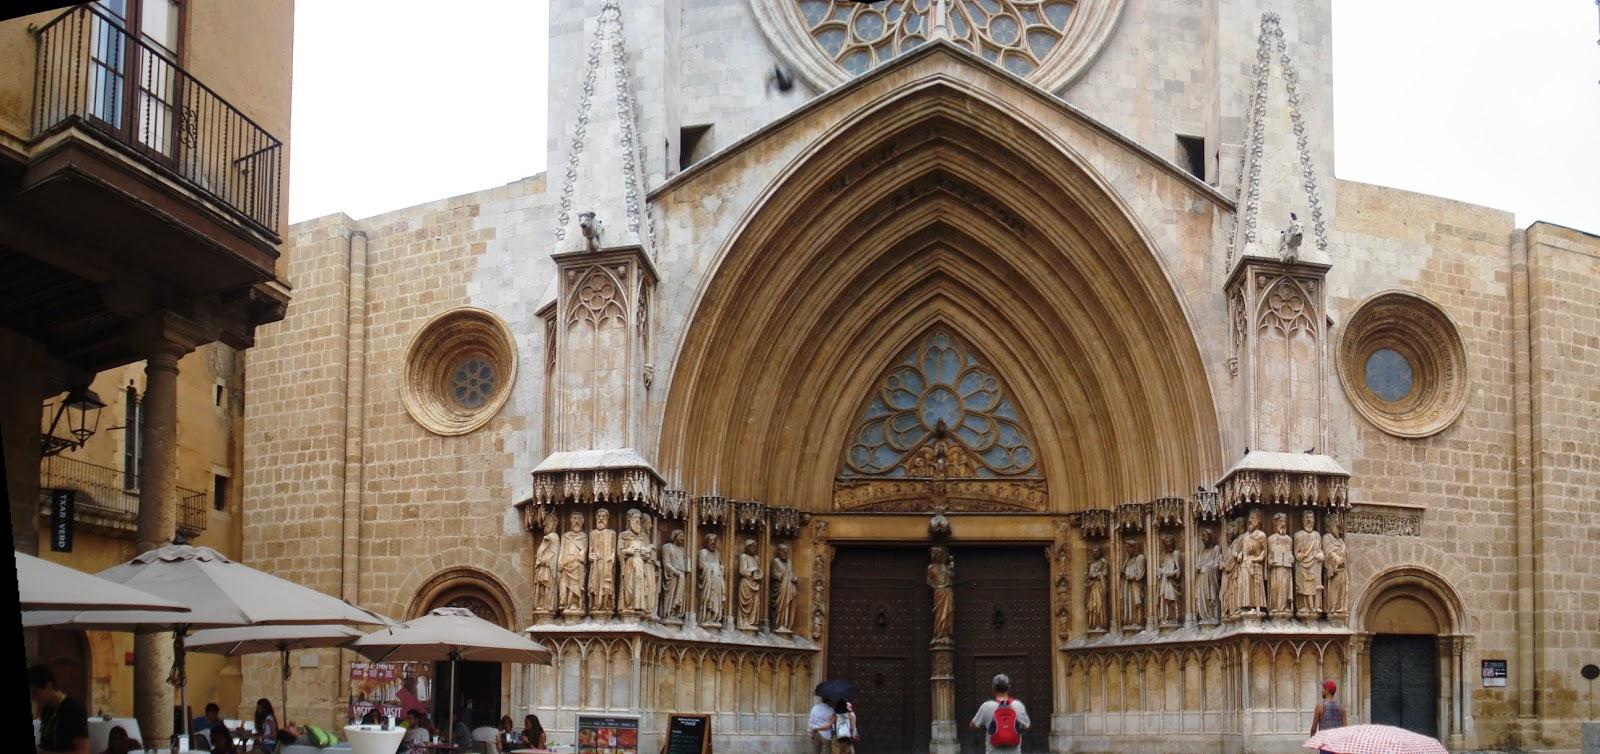 https://sites.google.com/site/australangel/Tarragona-.swf?attredirects=0